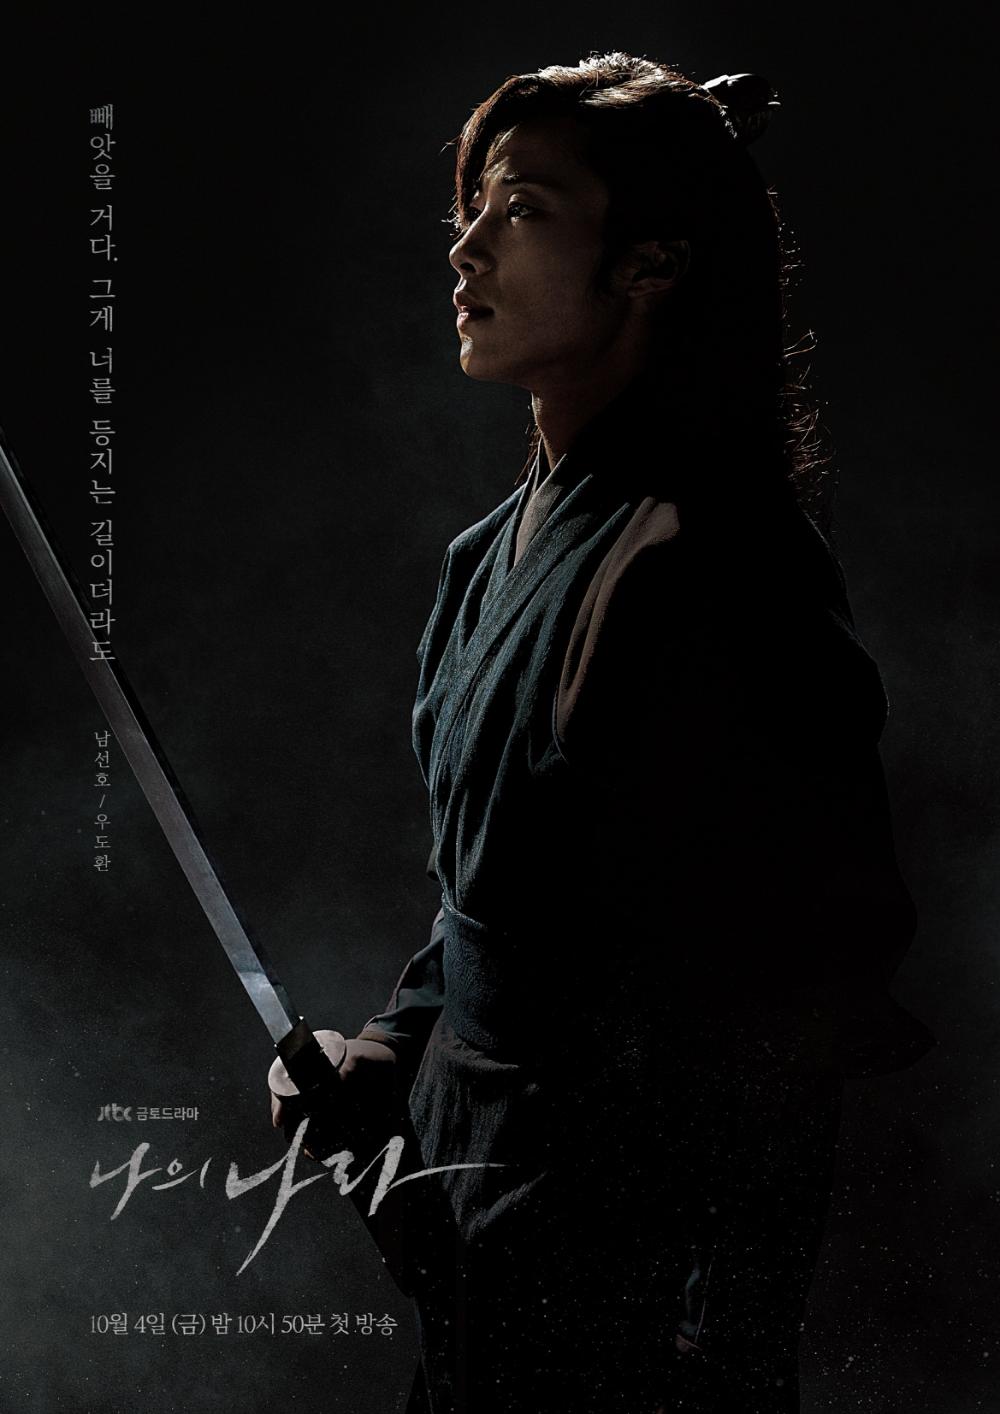 Pin by 朔月 on 나의 나라 Historical drama, Korean drama movies